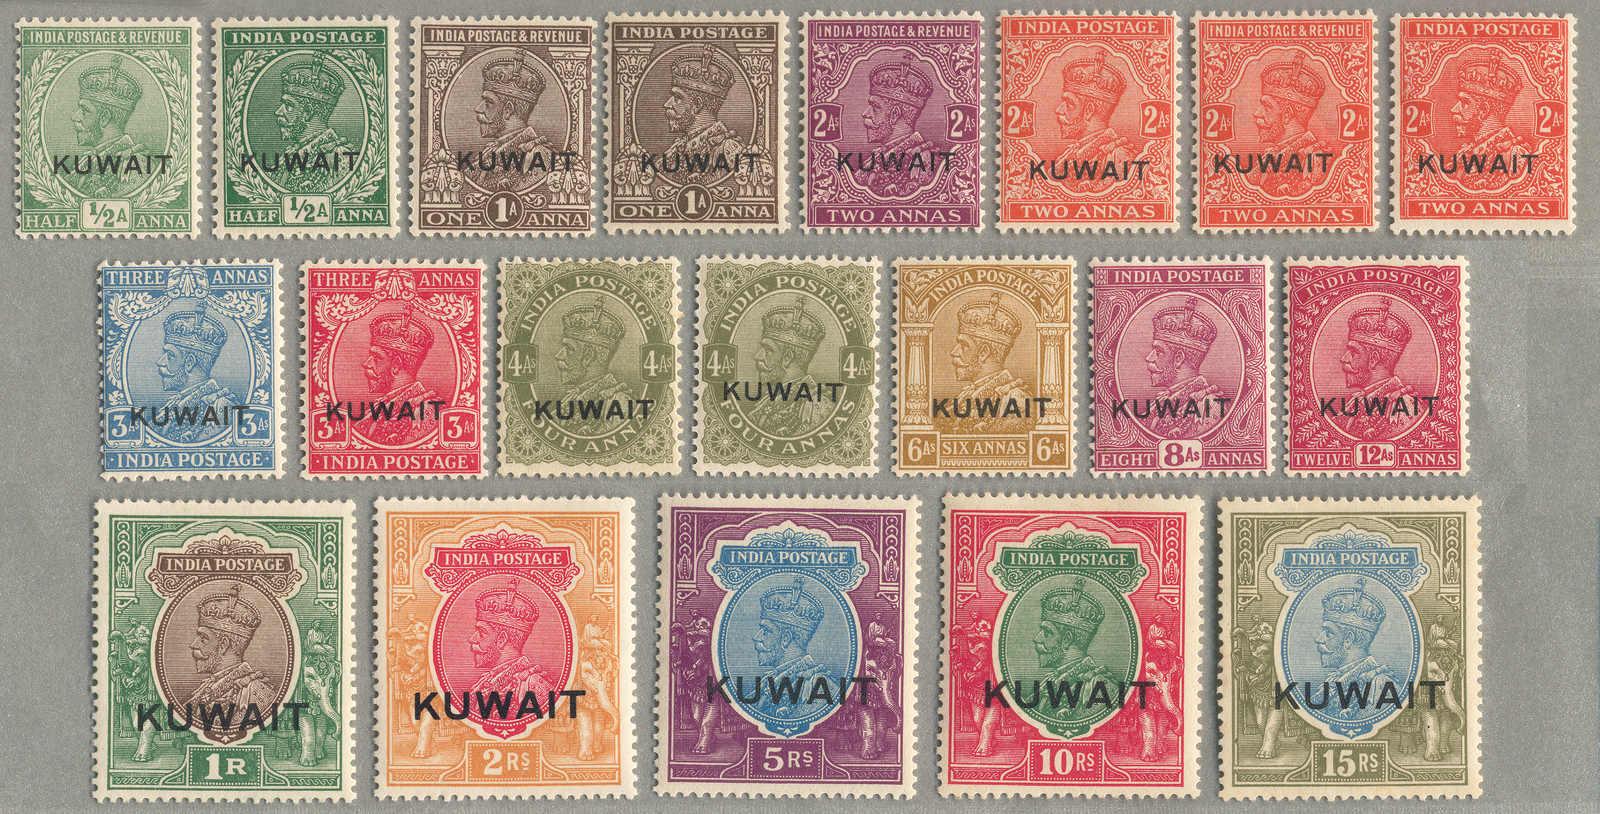 Lot 21261 - andere gebiete Kuwait Britische Periode -  classicphil GmbH 7'th classicphil Auction - Day 2